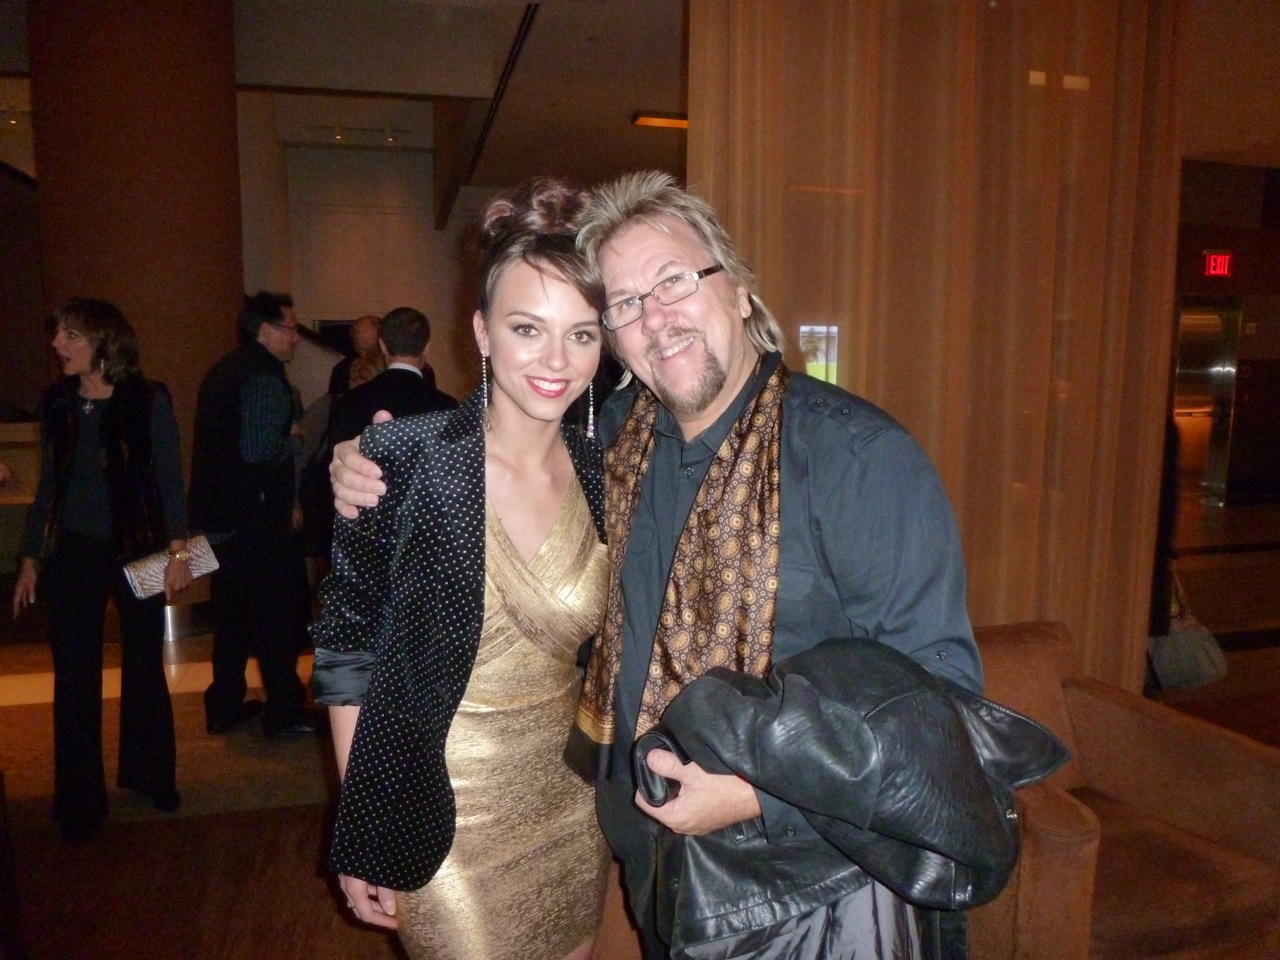 DP & Evelina Westin Lobby Nov 2 11.jpeg